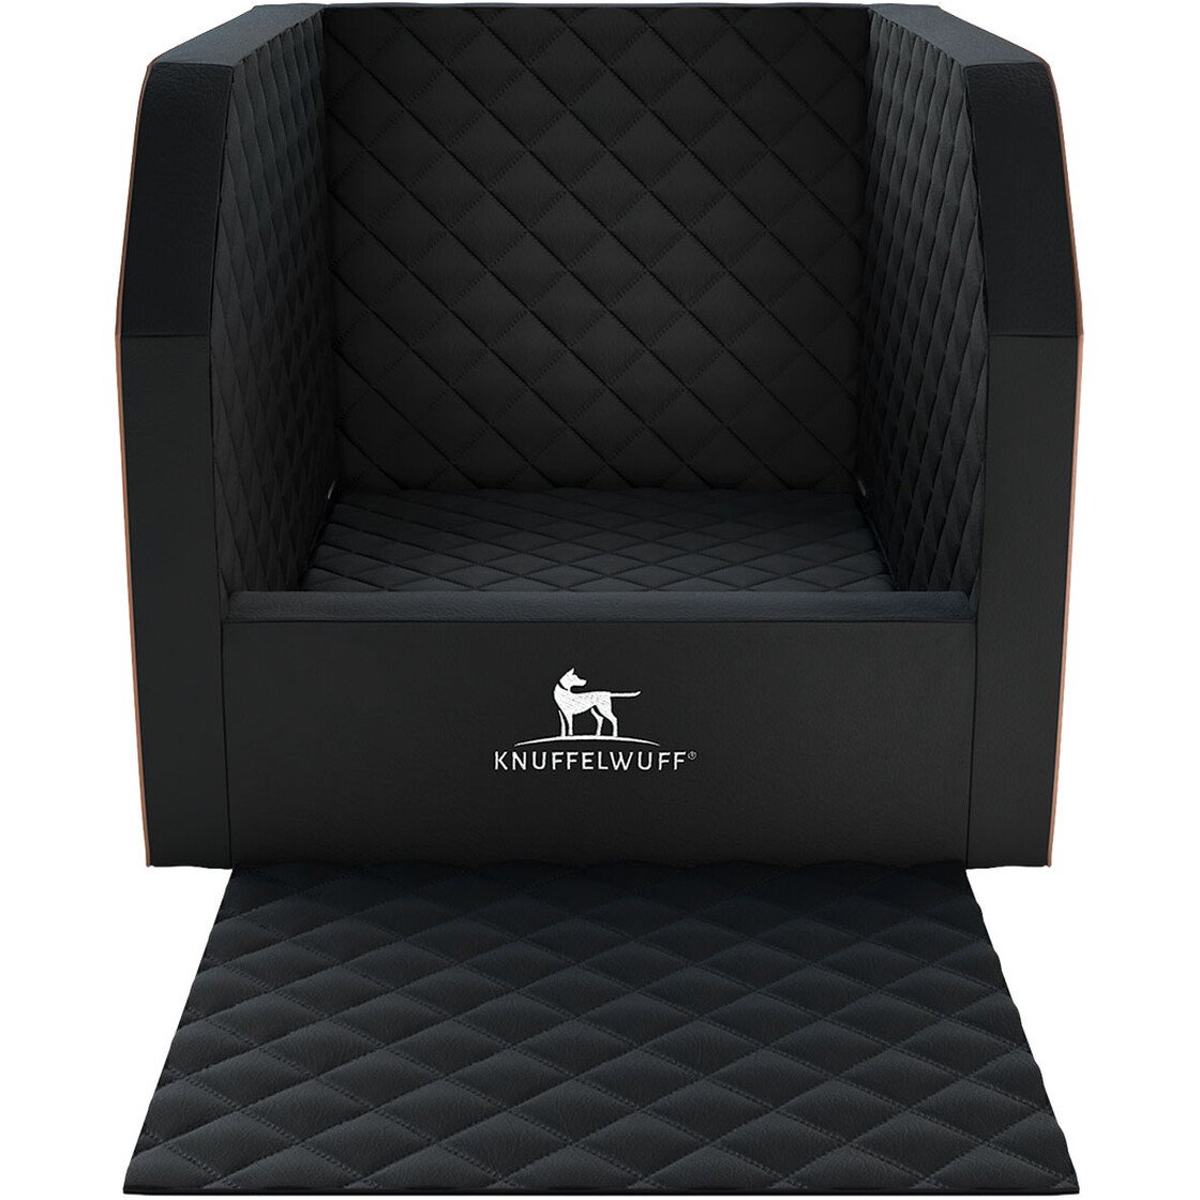 knuffelwuff cargo hundebox auto hunde autositz hundetransportbox tran 139 95. Black Bedroom Furniture Sets. Home Design Ideas